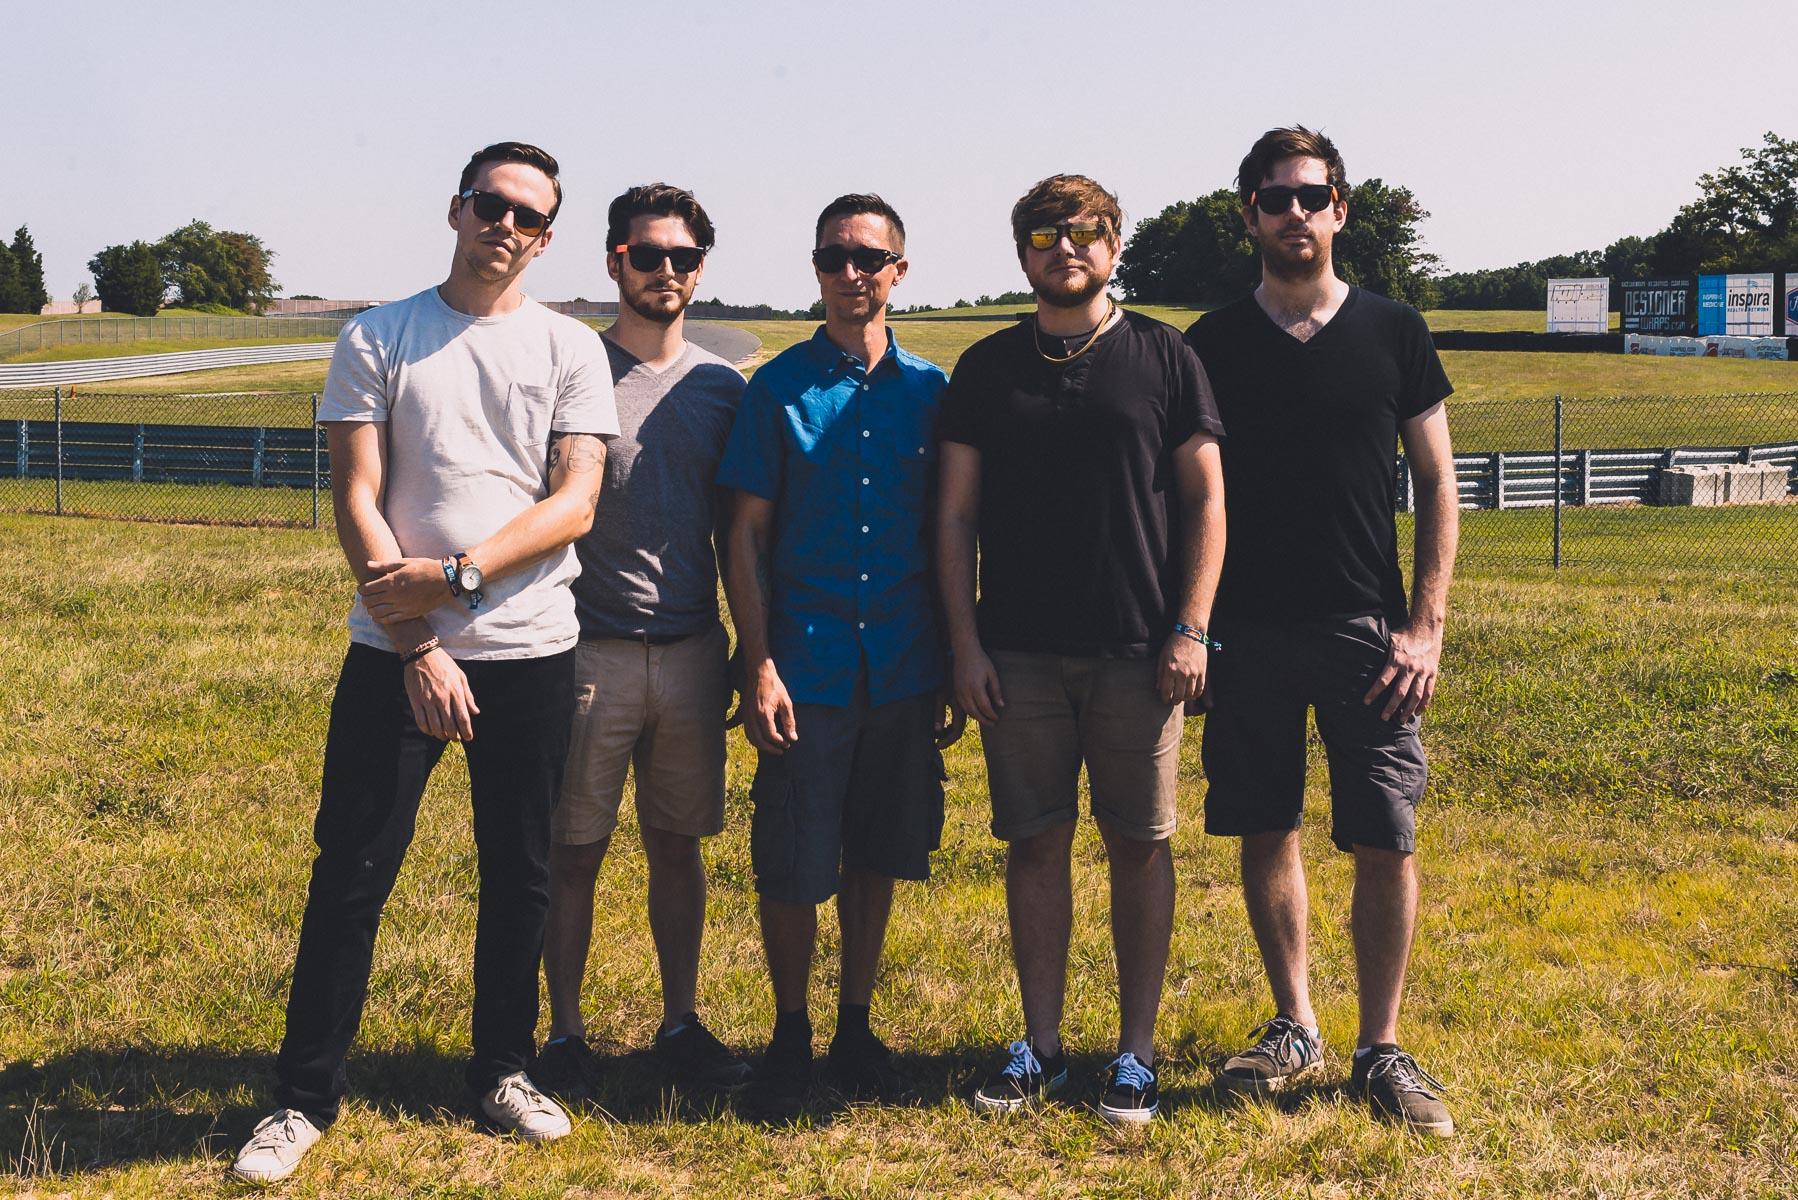 Stellar Young / 8/15/15 / Pinelands Music Festival / Millville, NJ